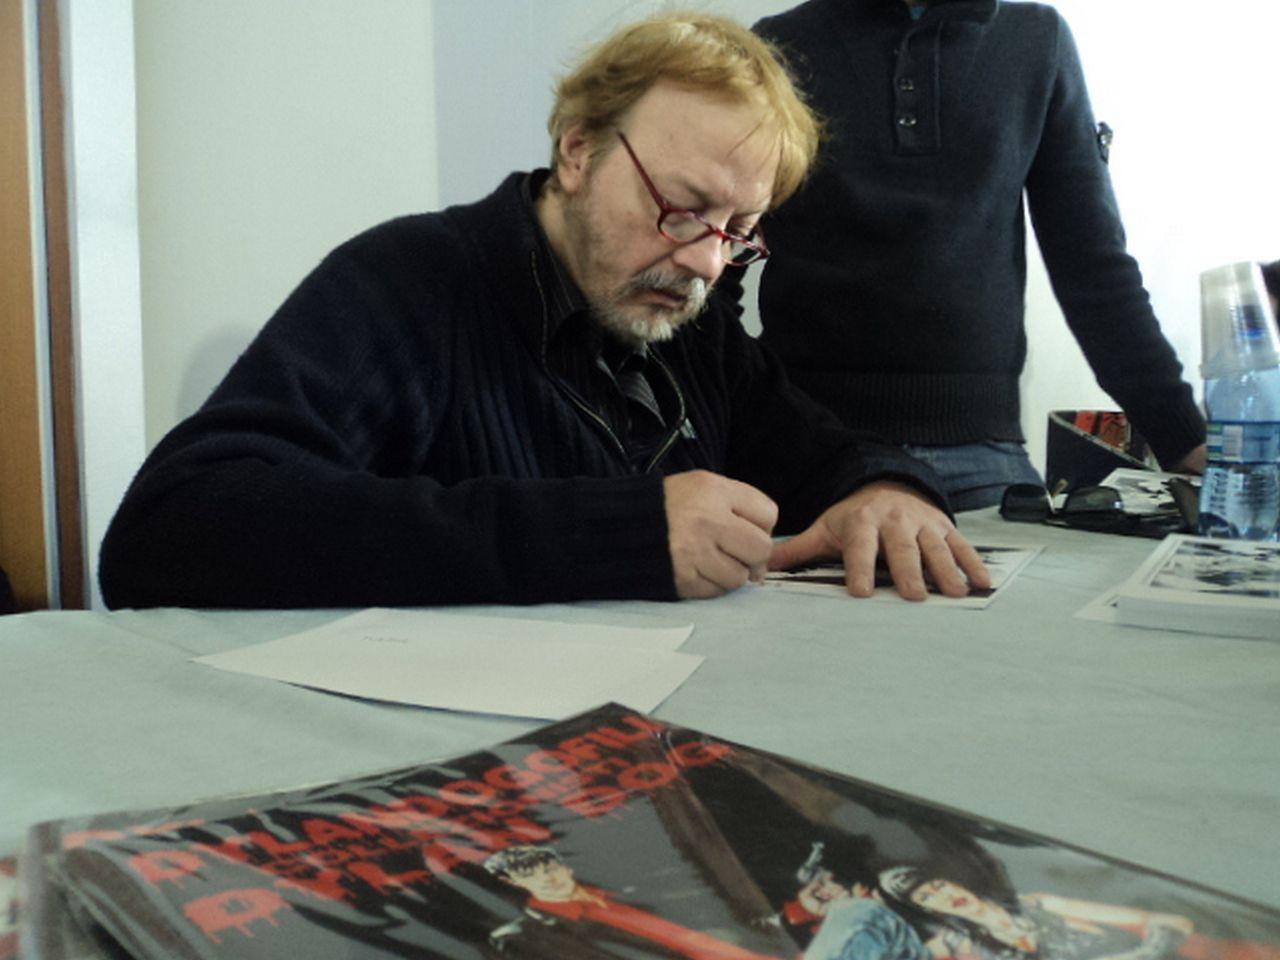 Franco Saudelli